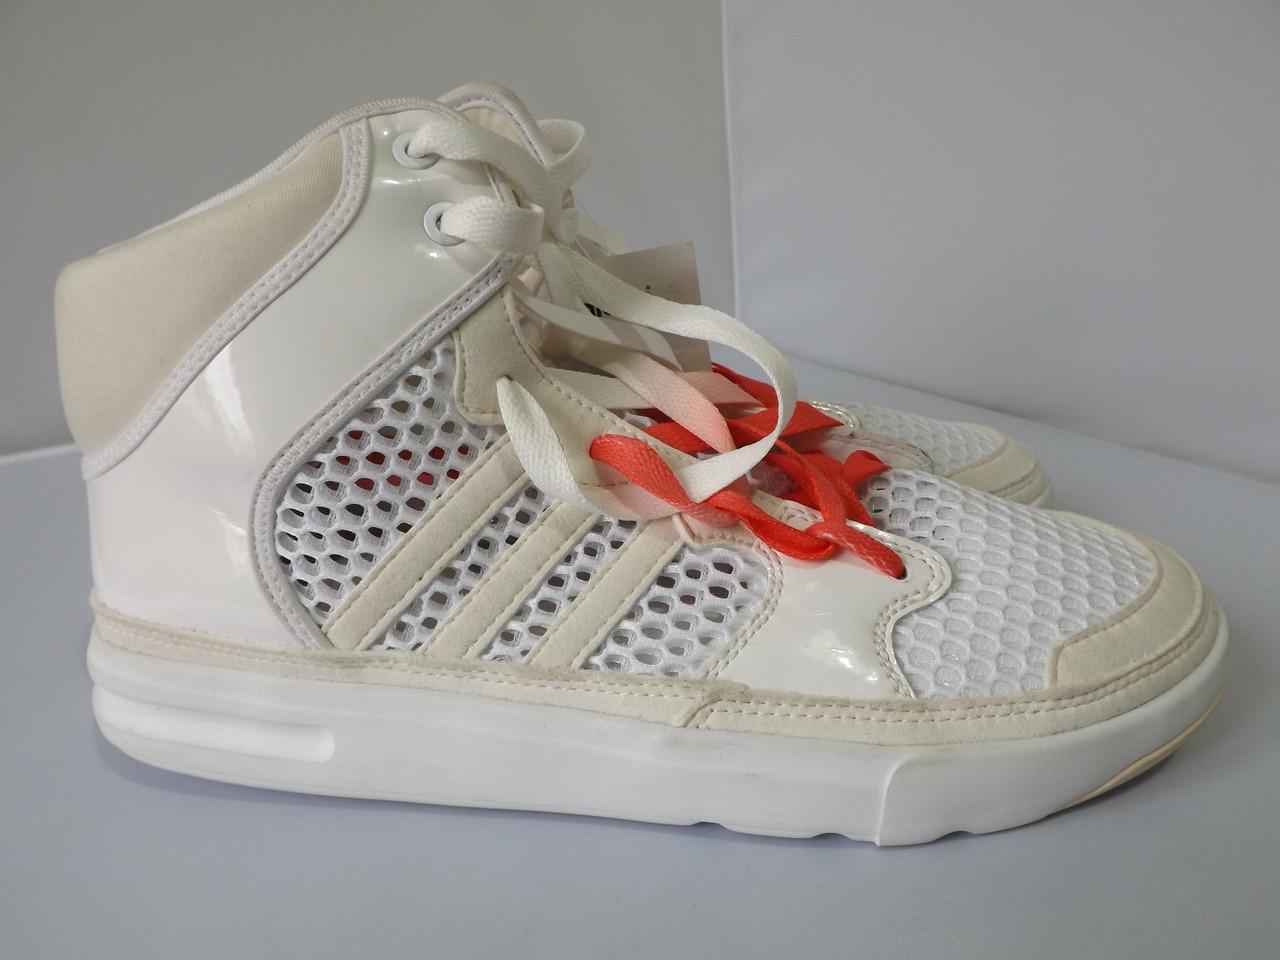 Adidas stellasport размер 42